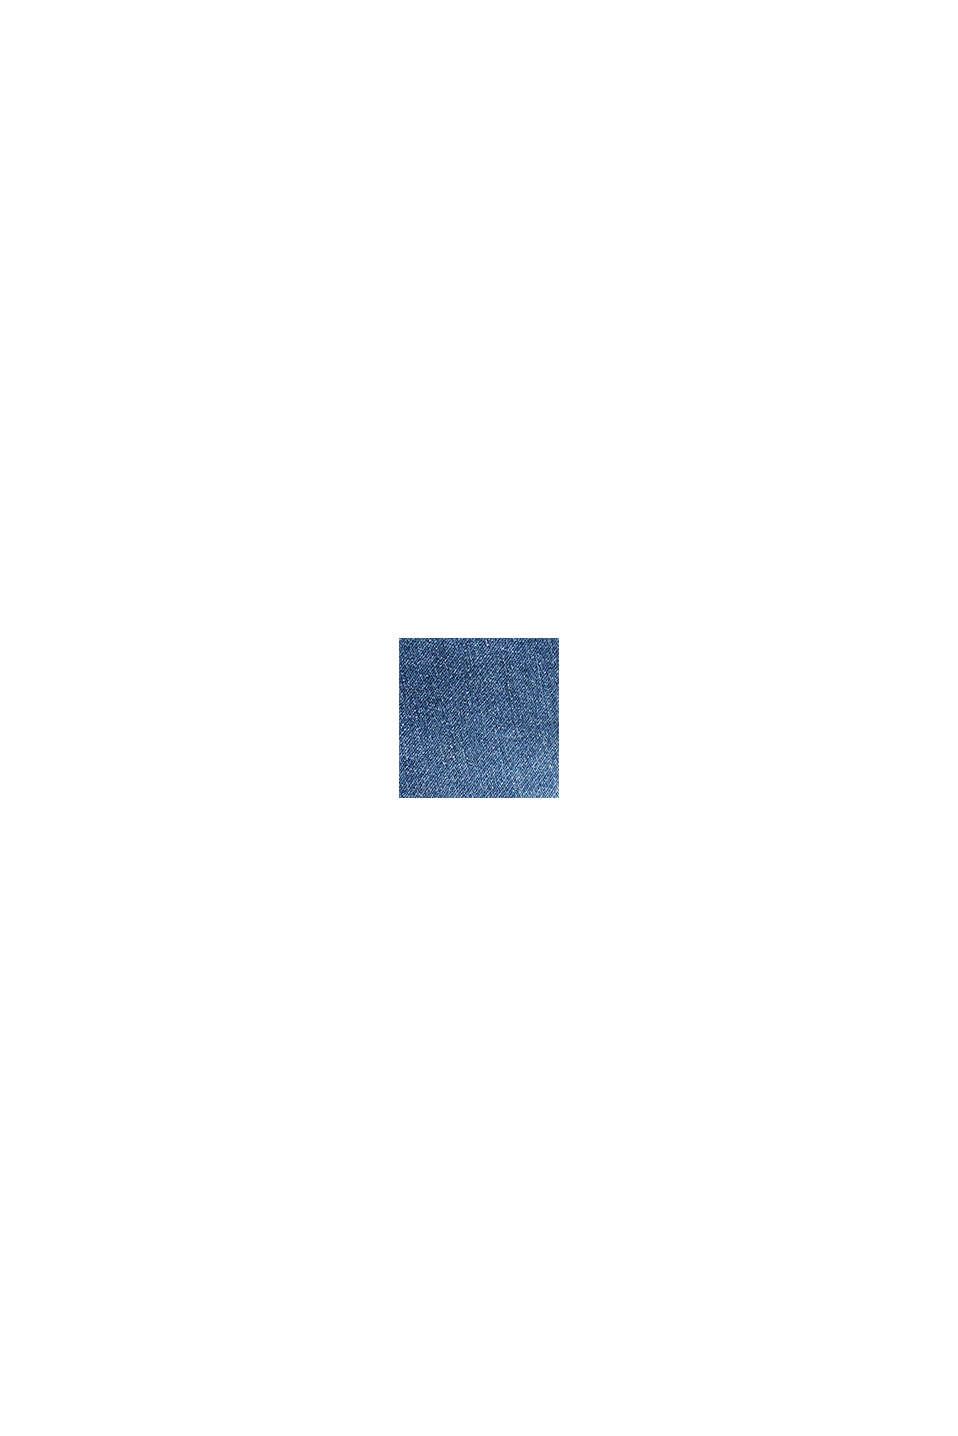 Comfortjeans met jersey voering, BLUE MEDIUM WASHED, swatch